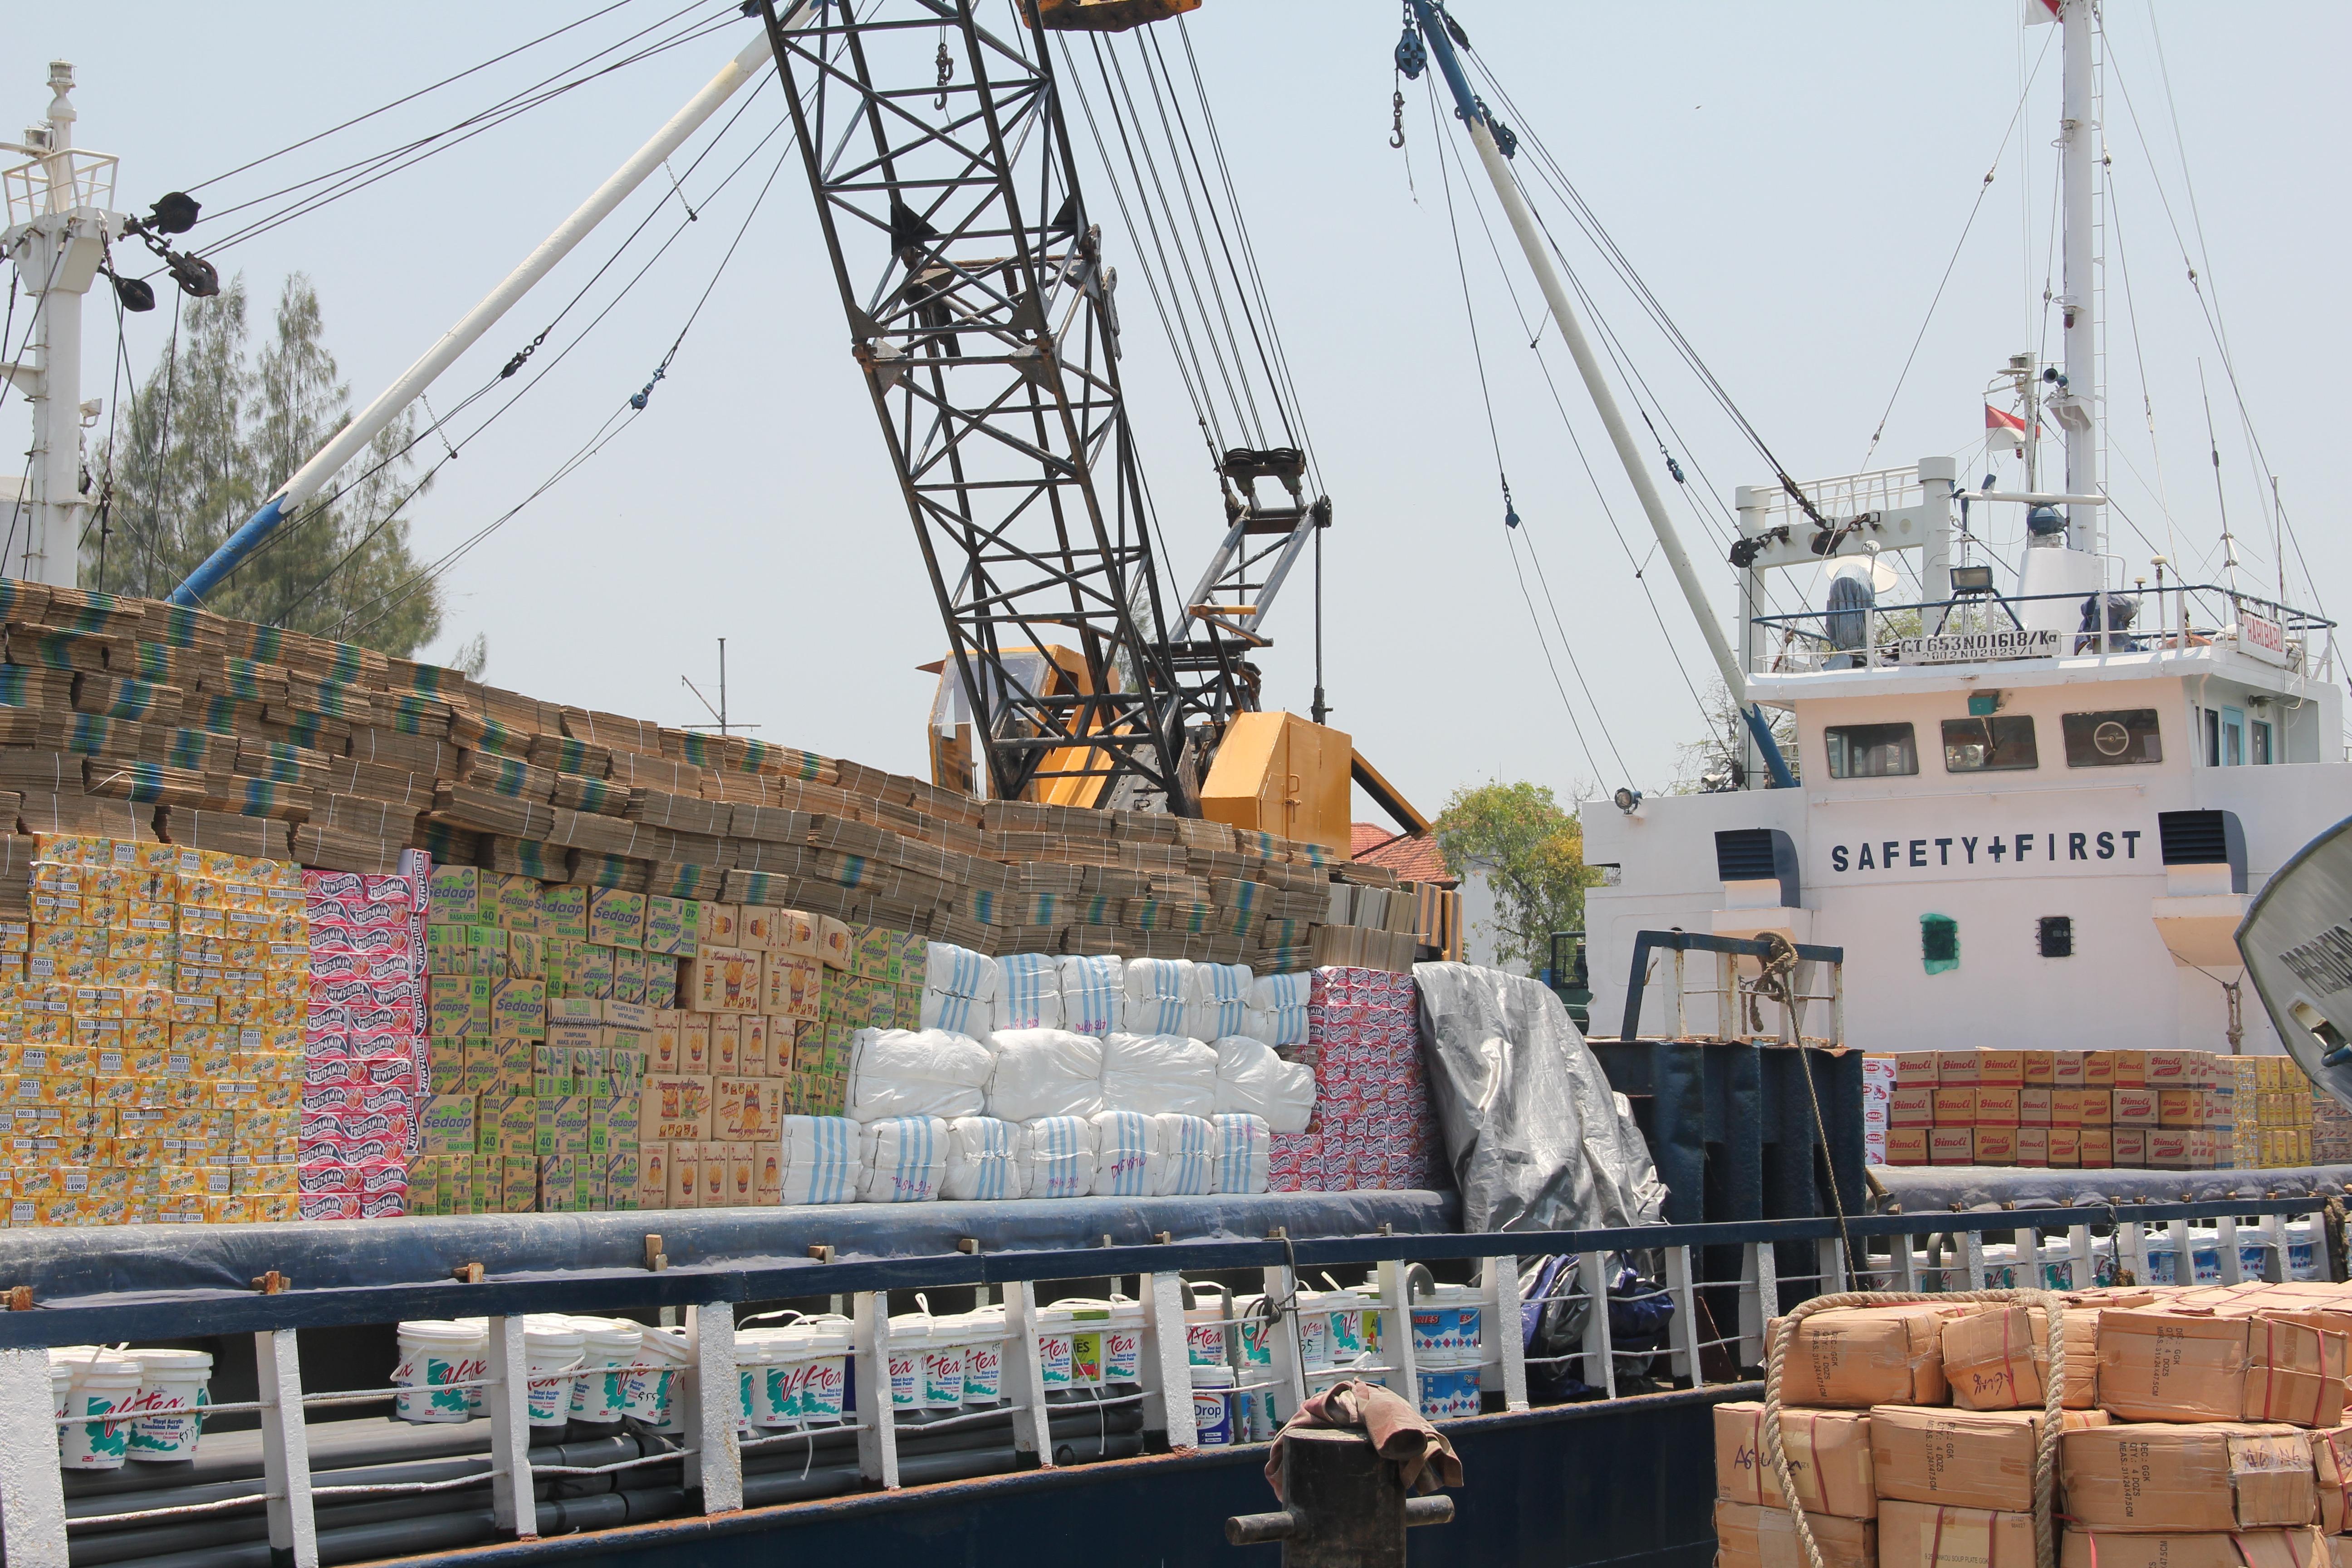 Free Images : ship, vehicle, mast, port, waterway